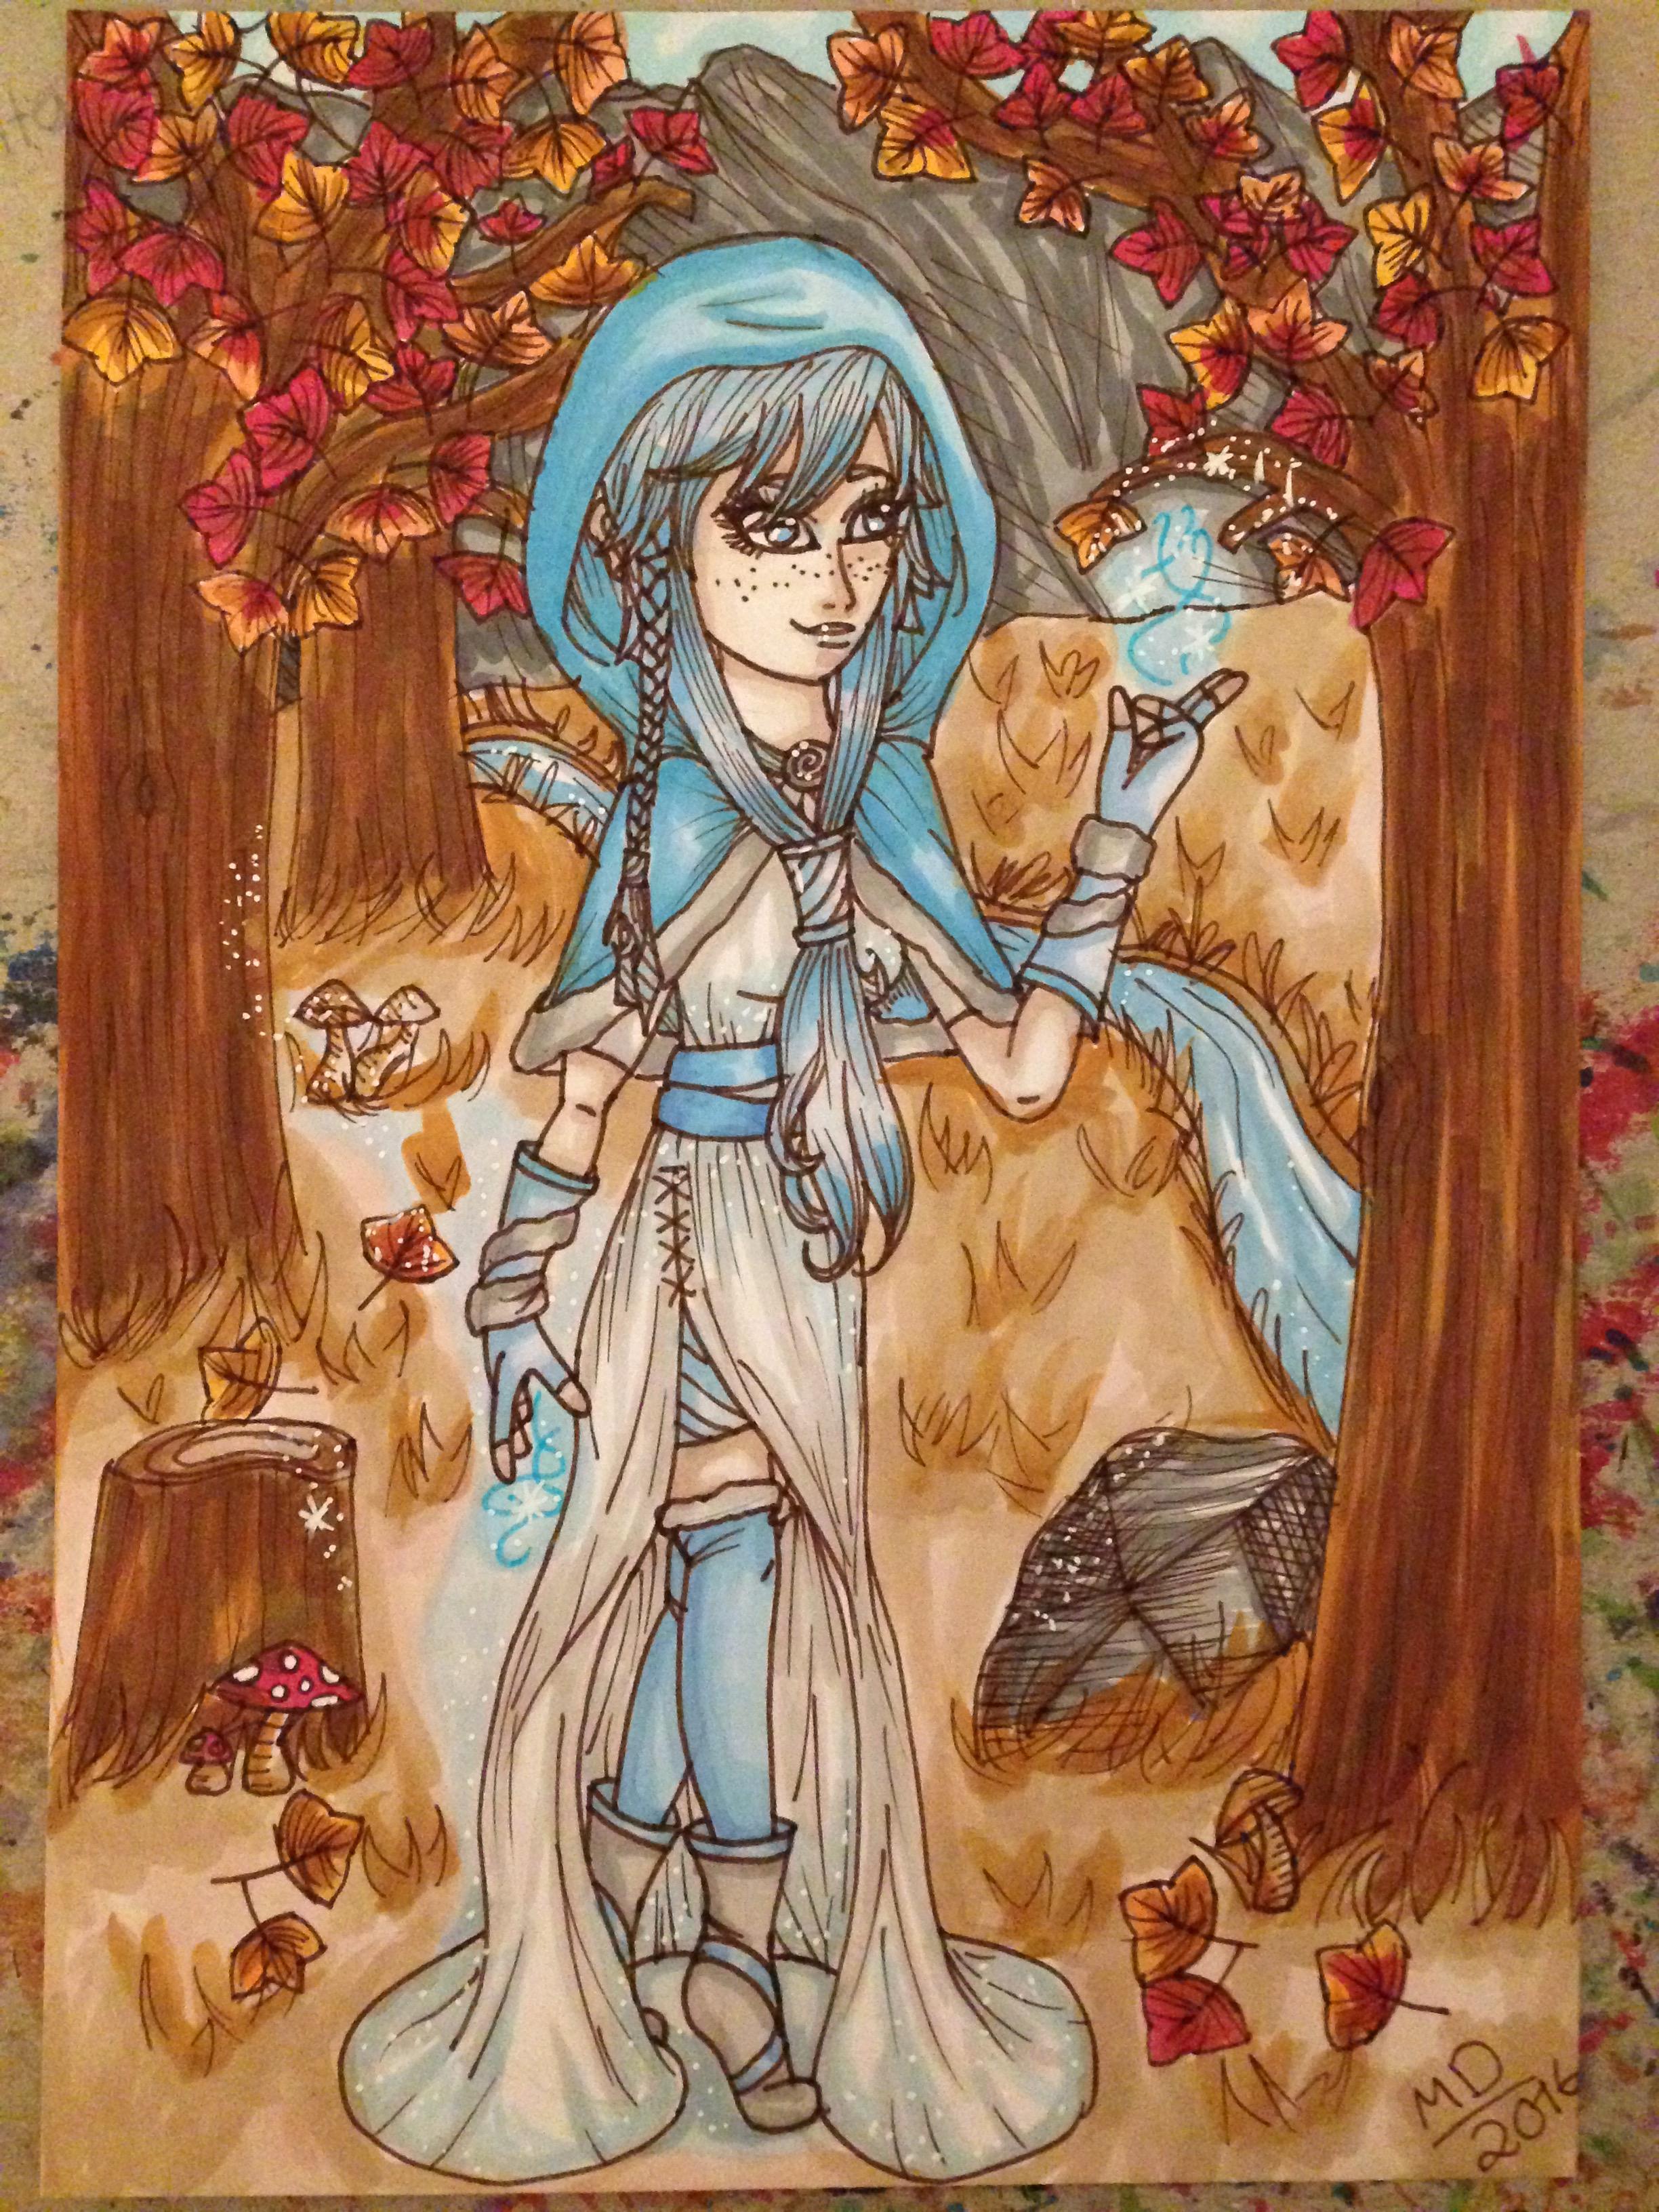 My Wandering Seasons Artwork (Final piece)